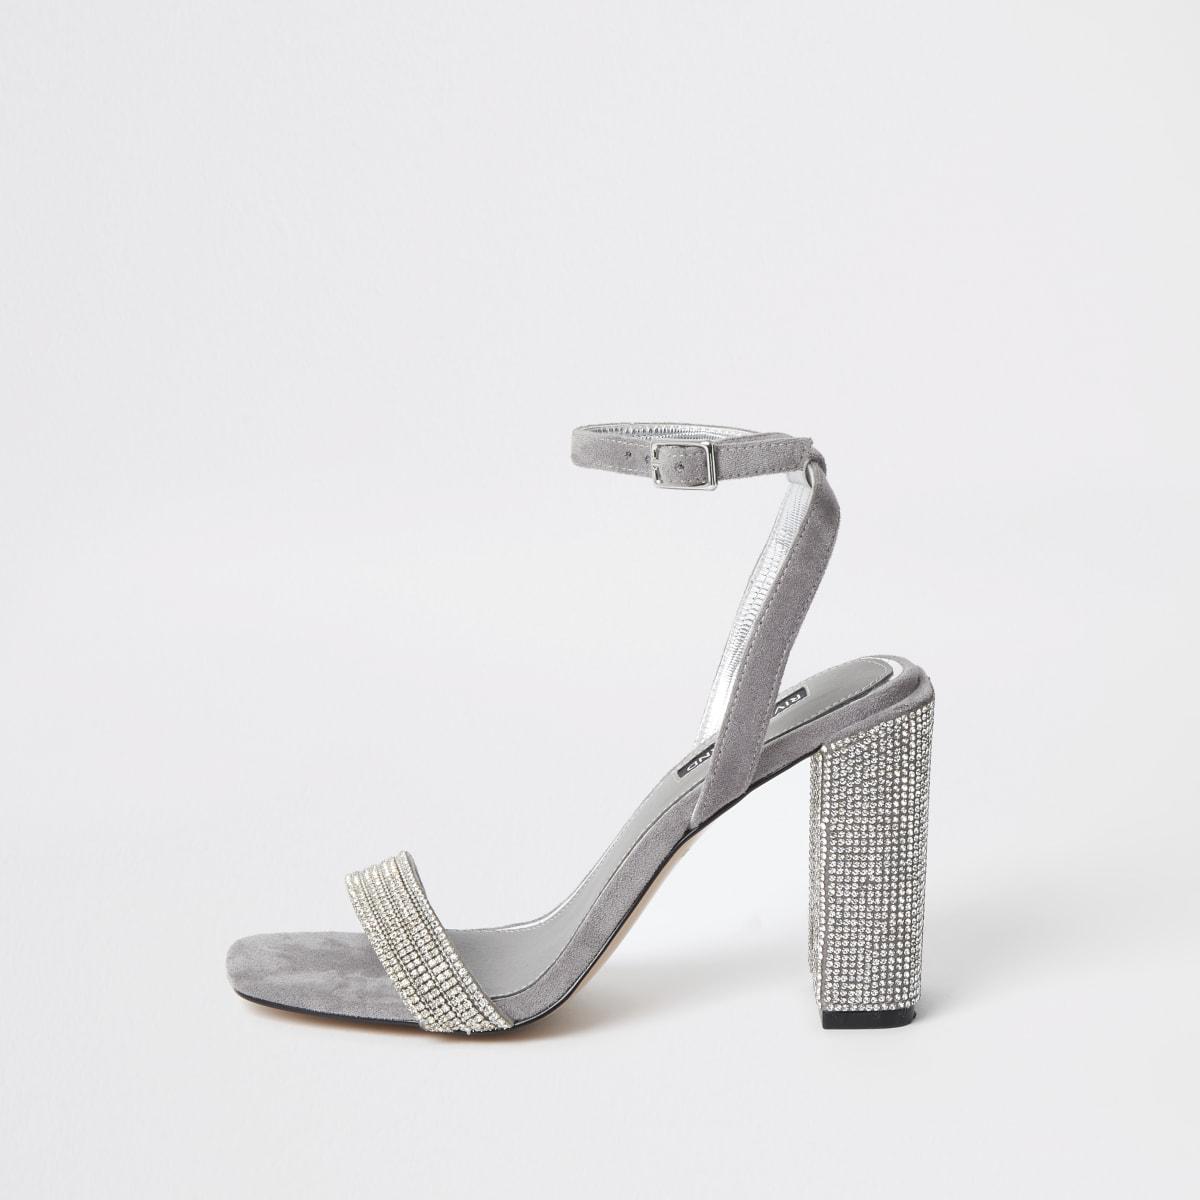 Grijze sandalen met blokhak en diamanté versiering